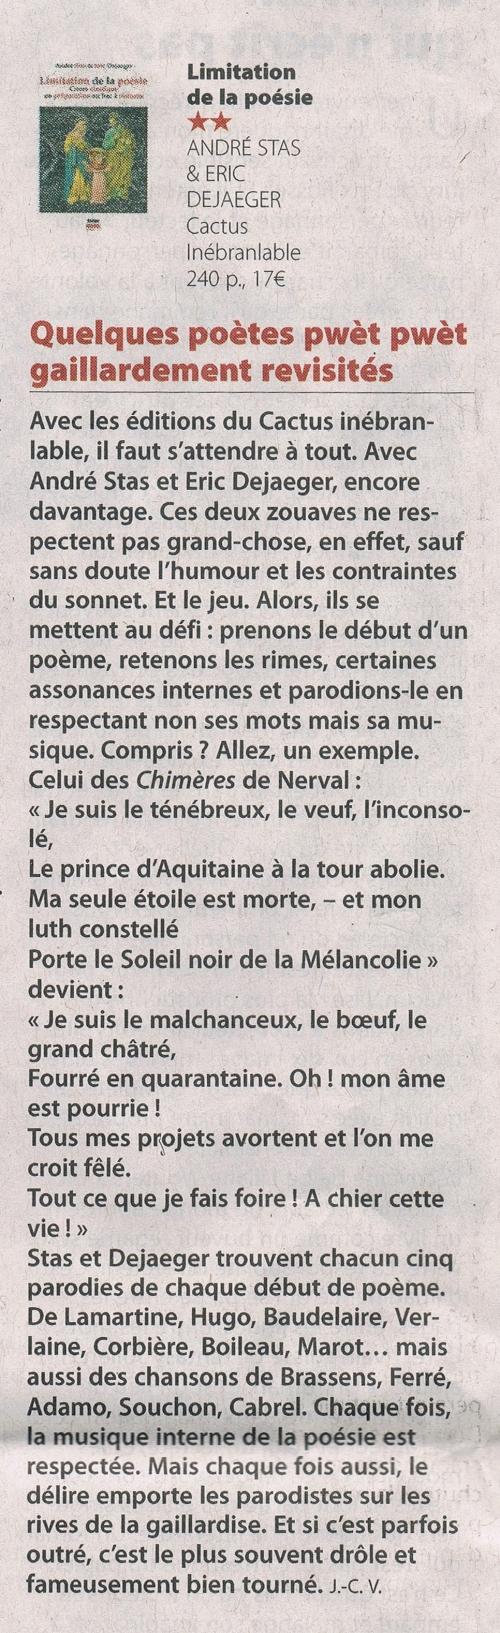 JC Van Troyen - Limitation de la poésie Le Soir du 16-01-21.jpg